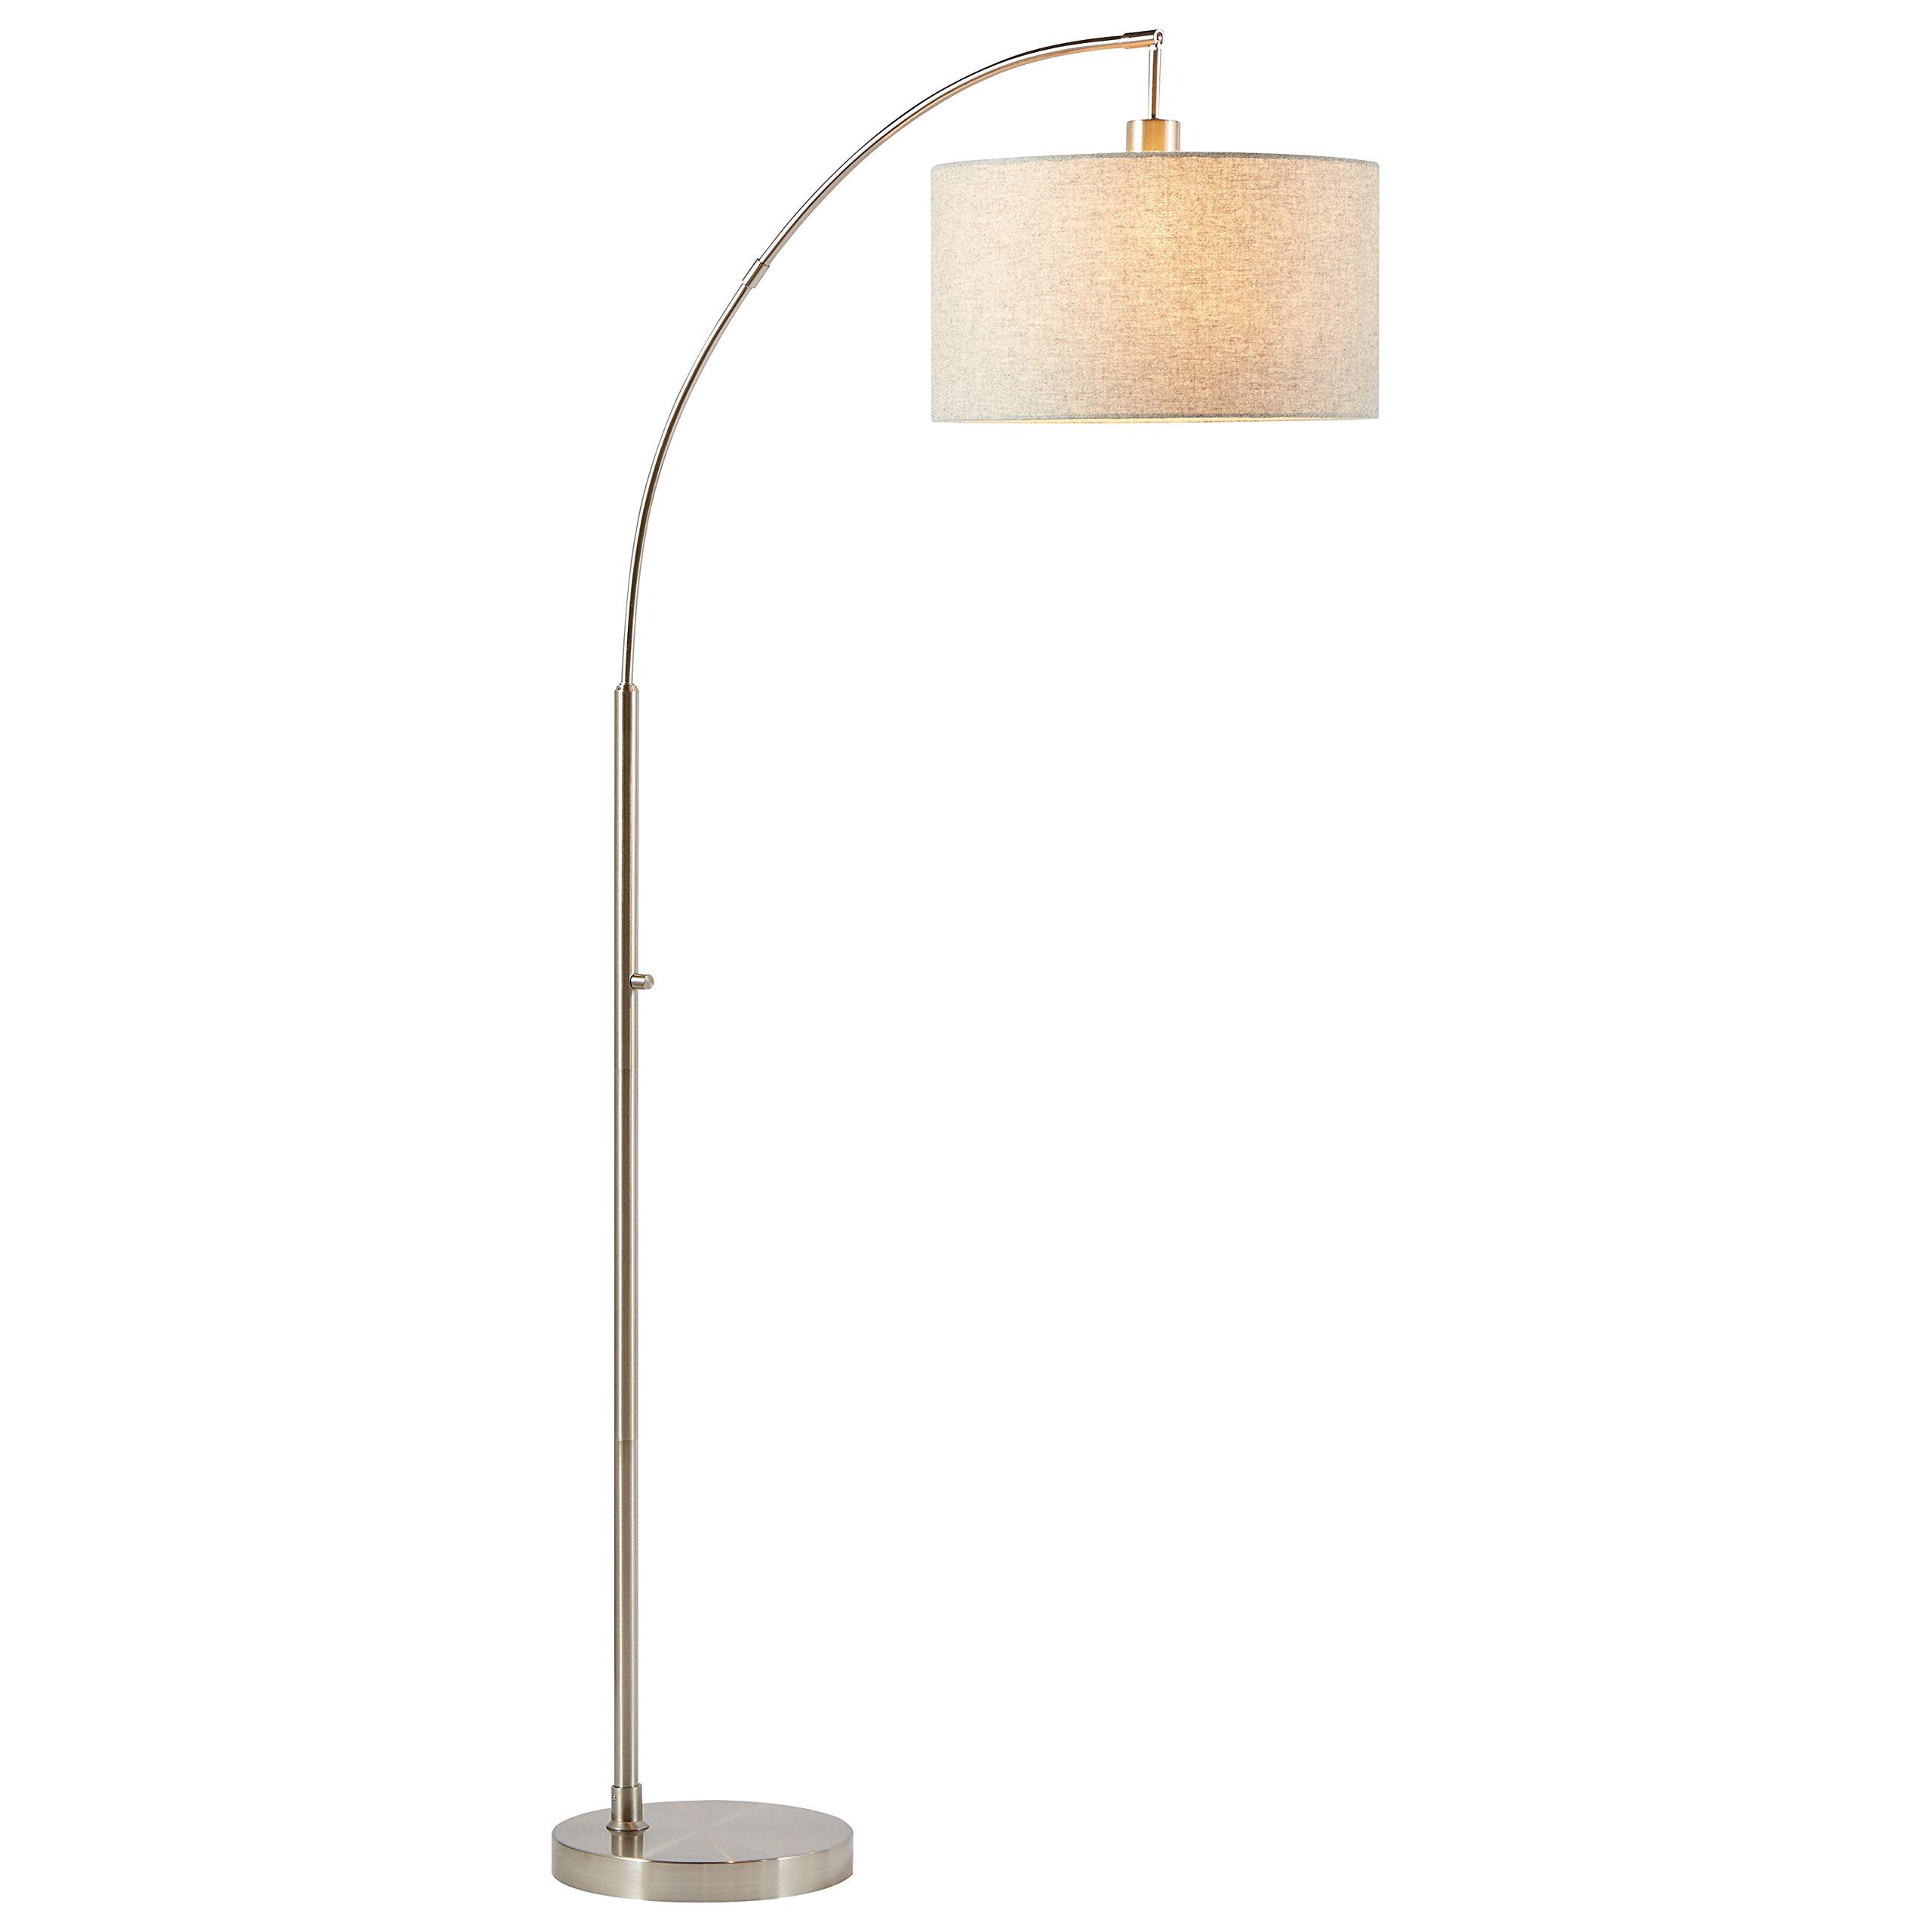 Rivet Steel Arc Floor Lamp, 69''H, With Bulb, Fabric Shade